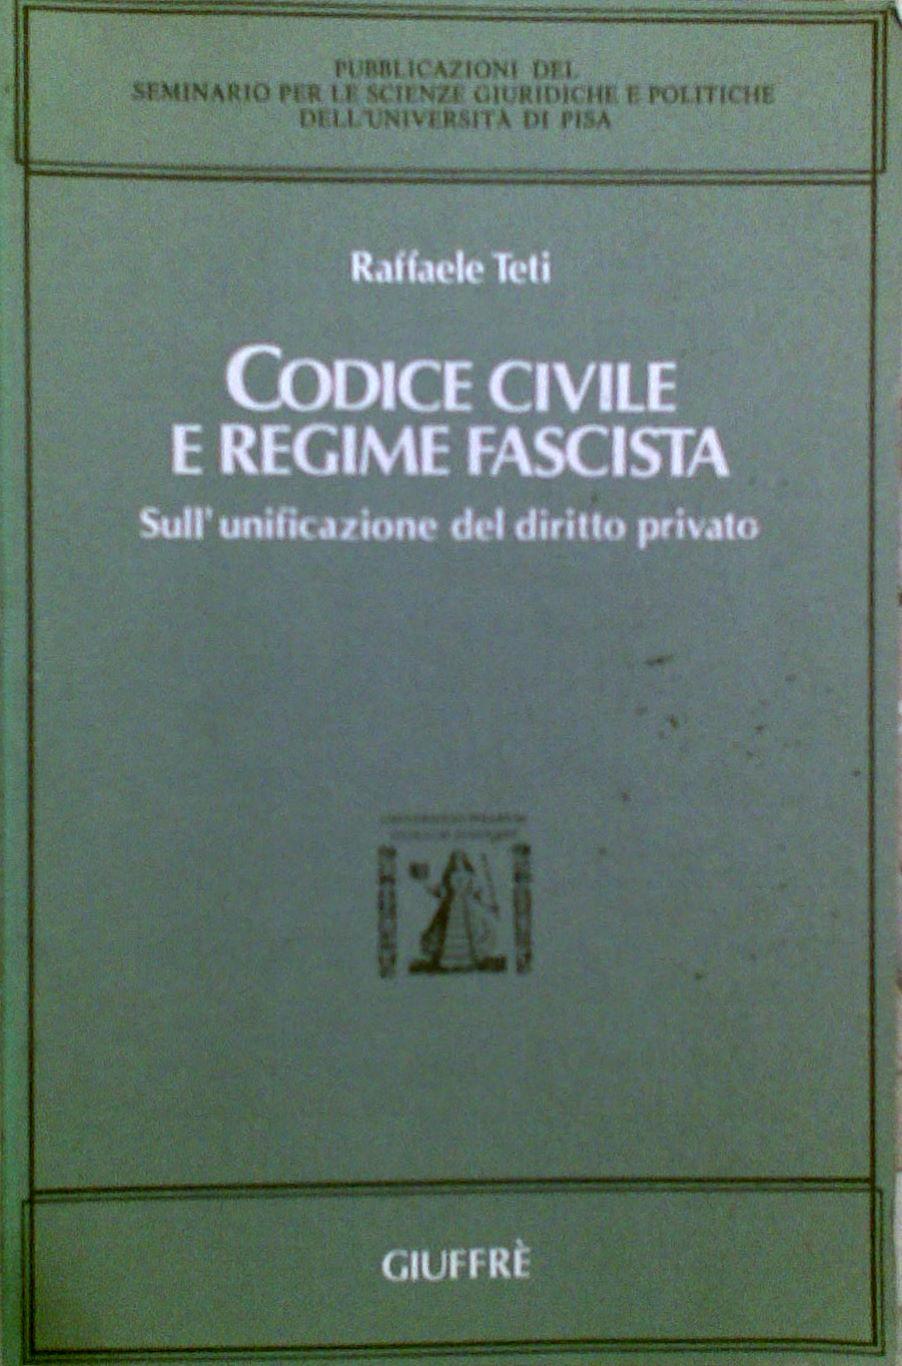 Codice civile e regime fascista